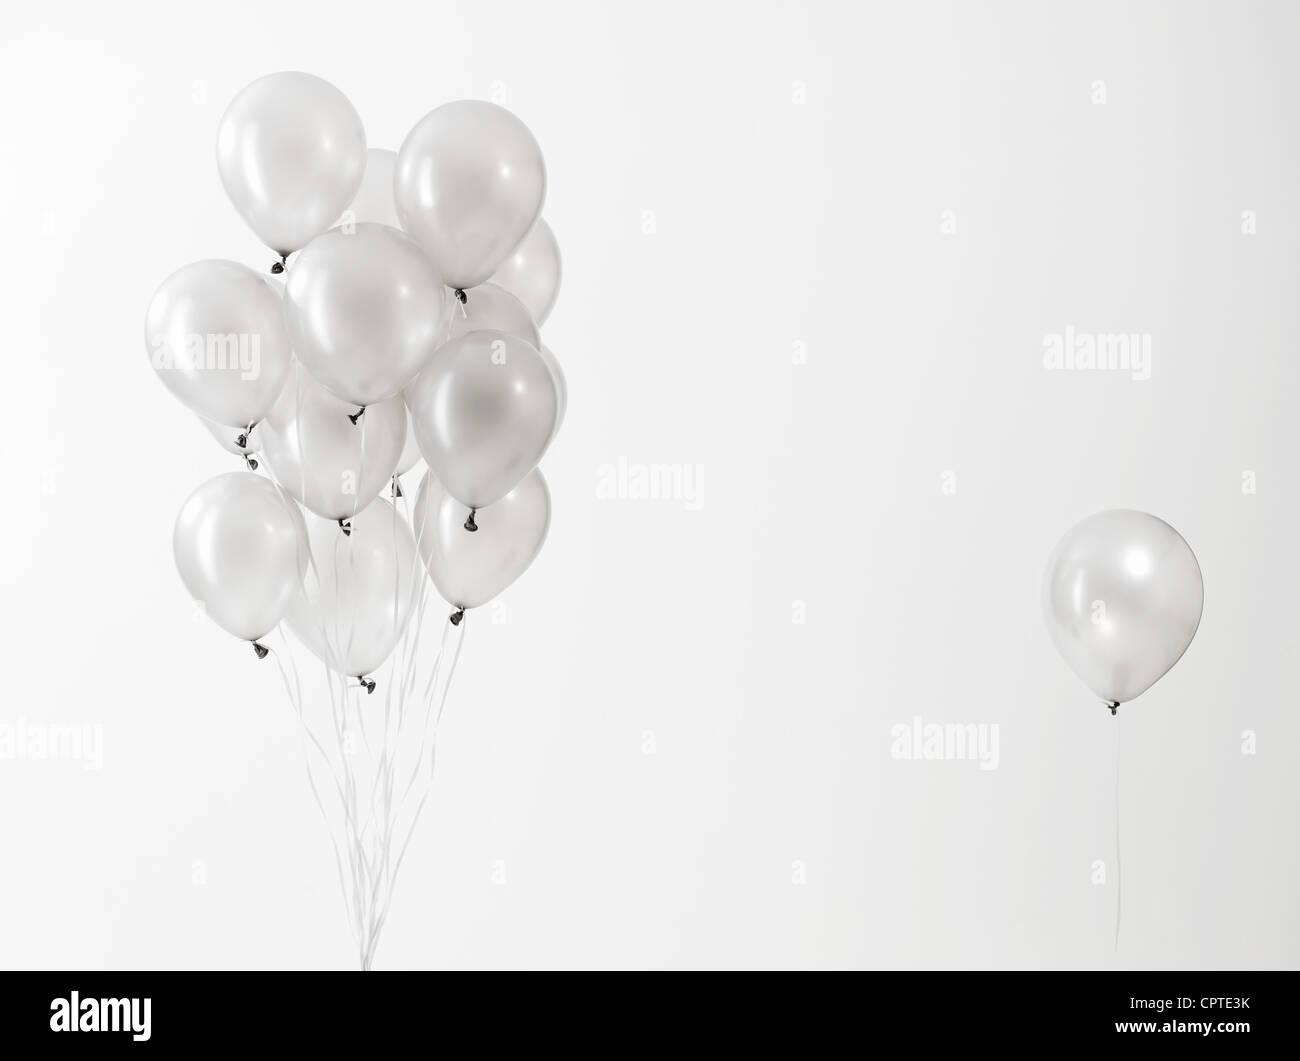 Globos plateados flotando contra fondo blanco. Imagen De Stock